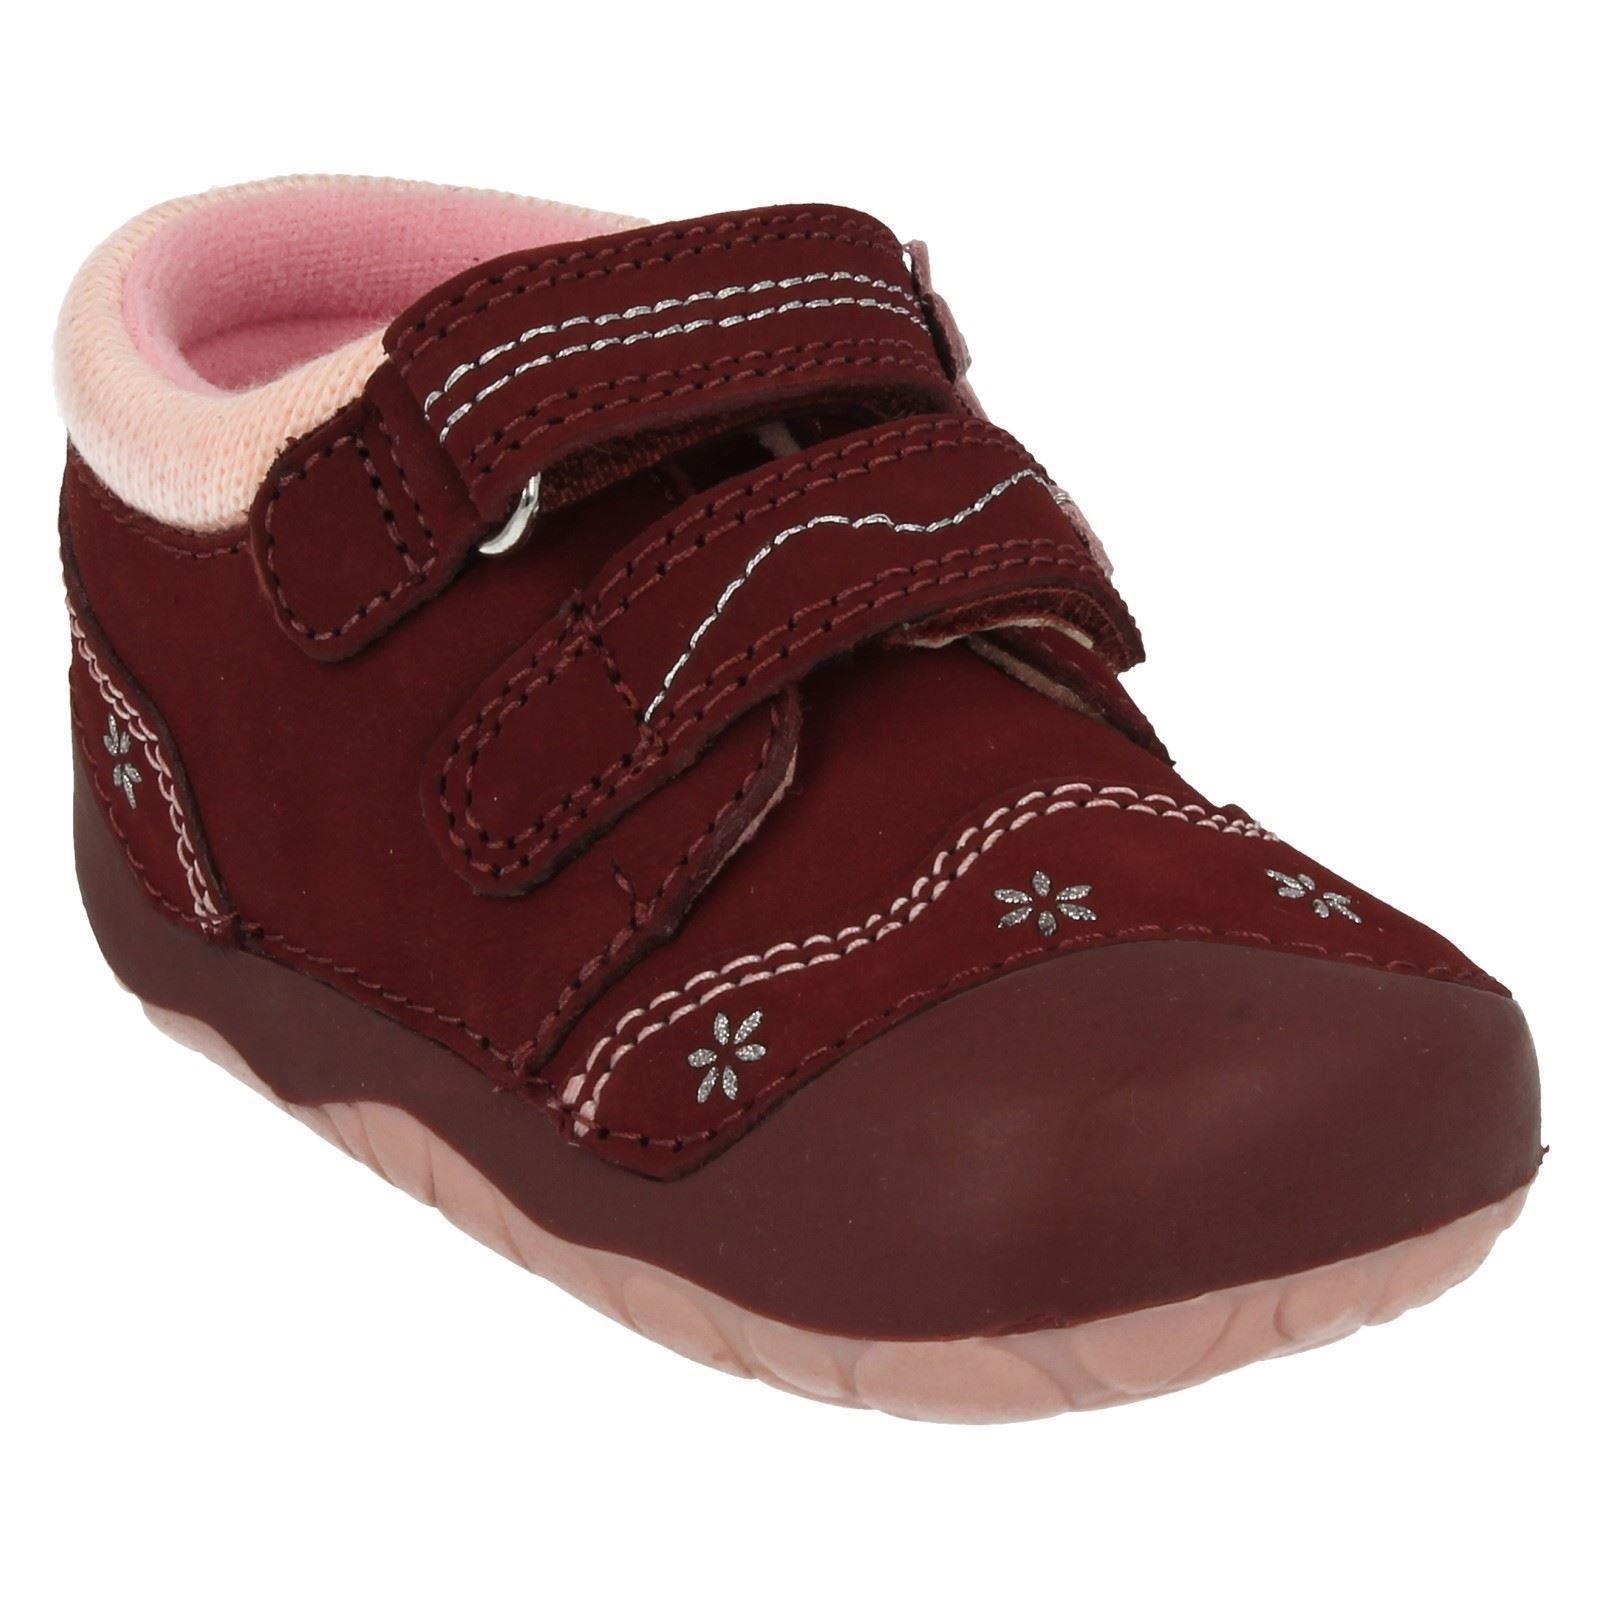 Startrite Girls Shoes Pixie Cruiser